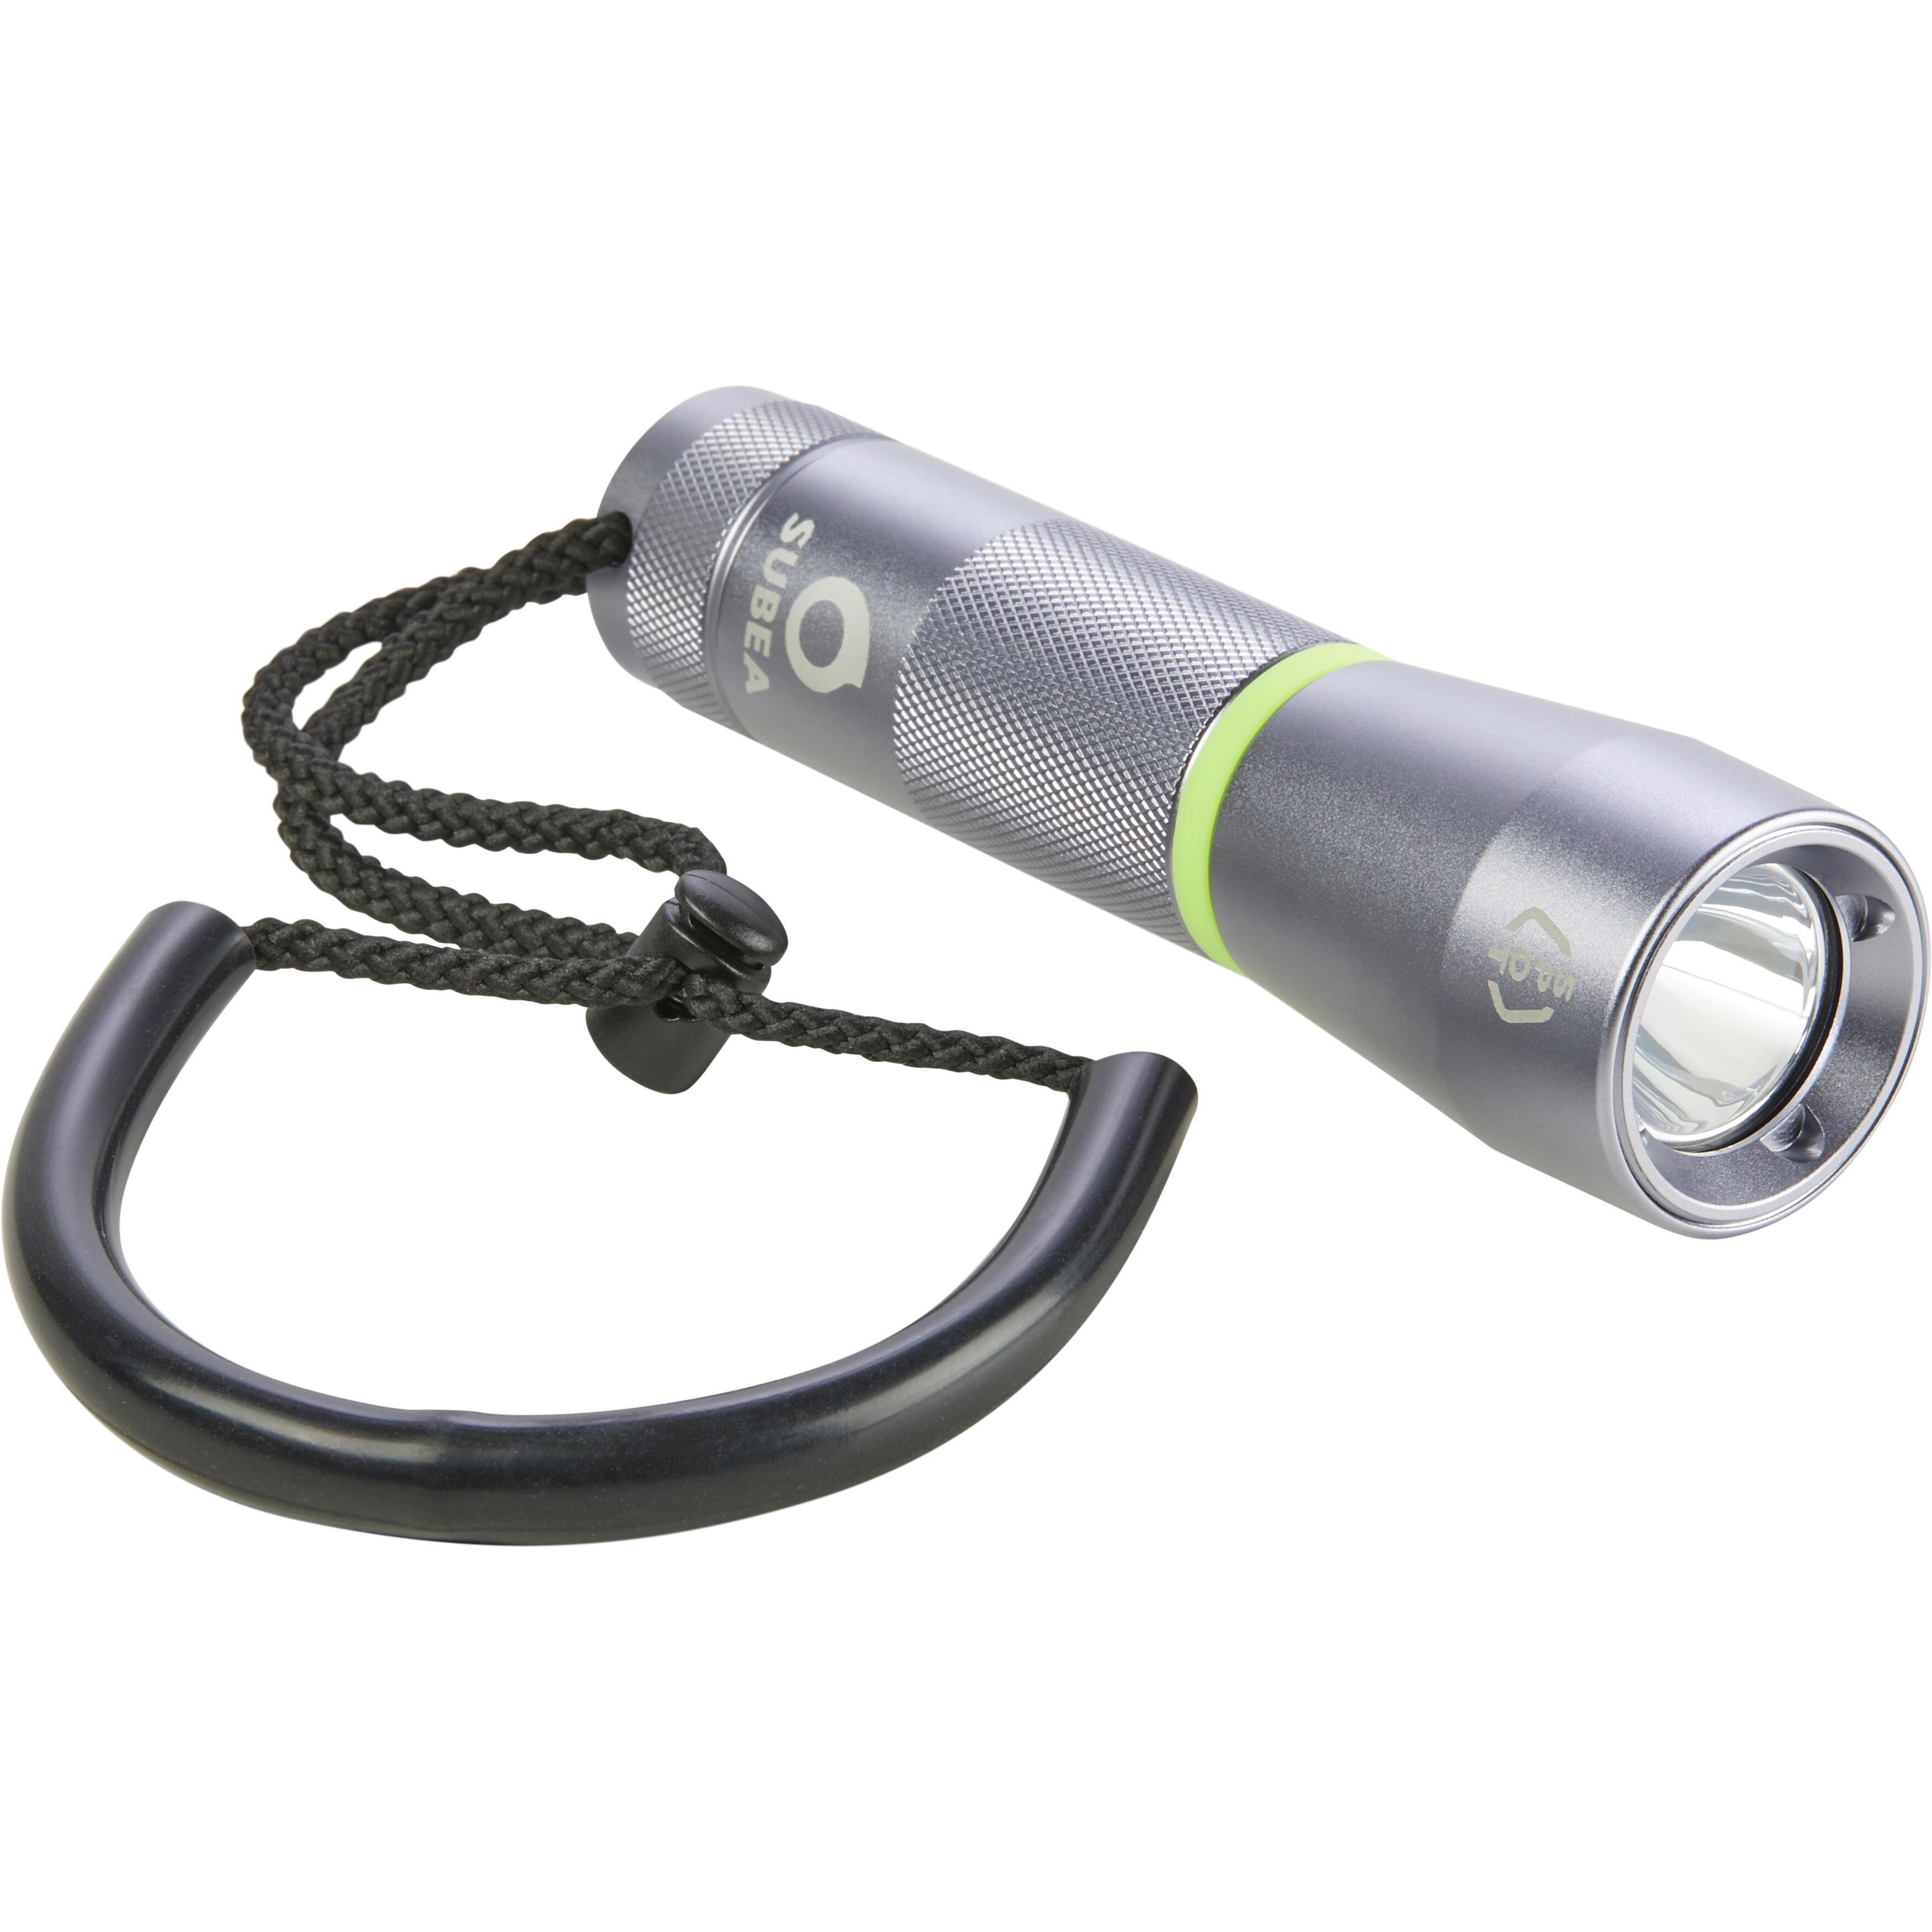 Foco/linterna de submarinismo SCD 100 spot 100 lumen, 3000 lux, estanca 100 m